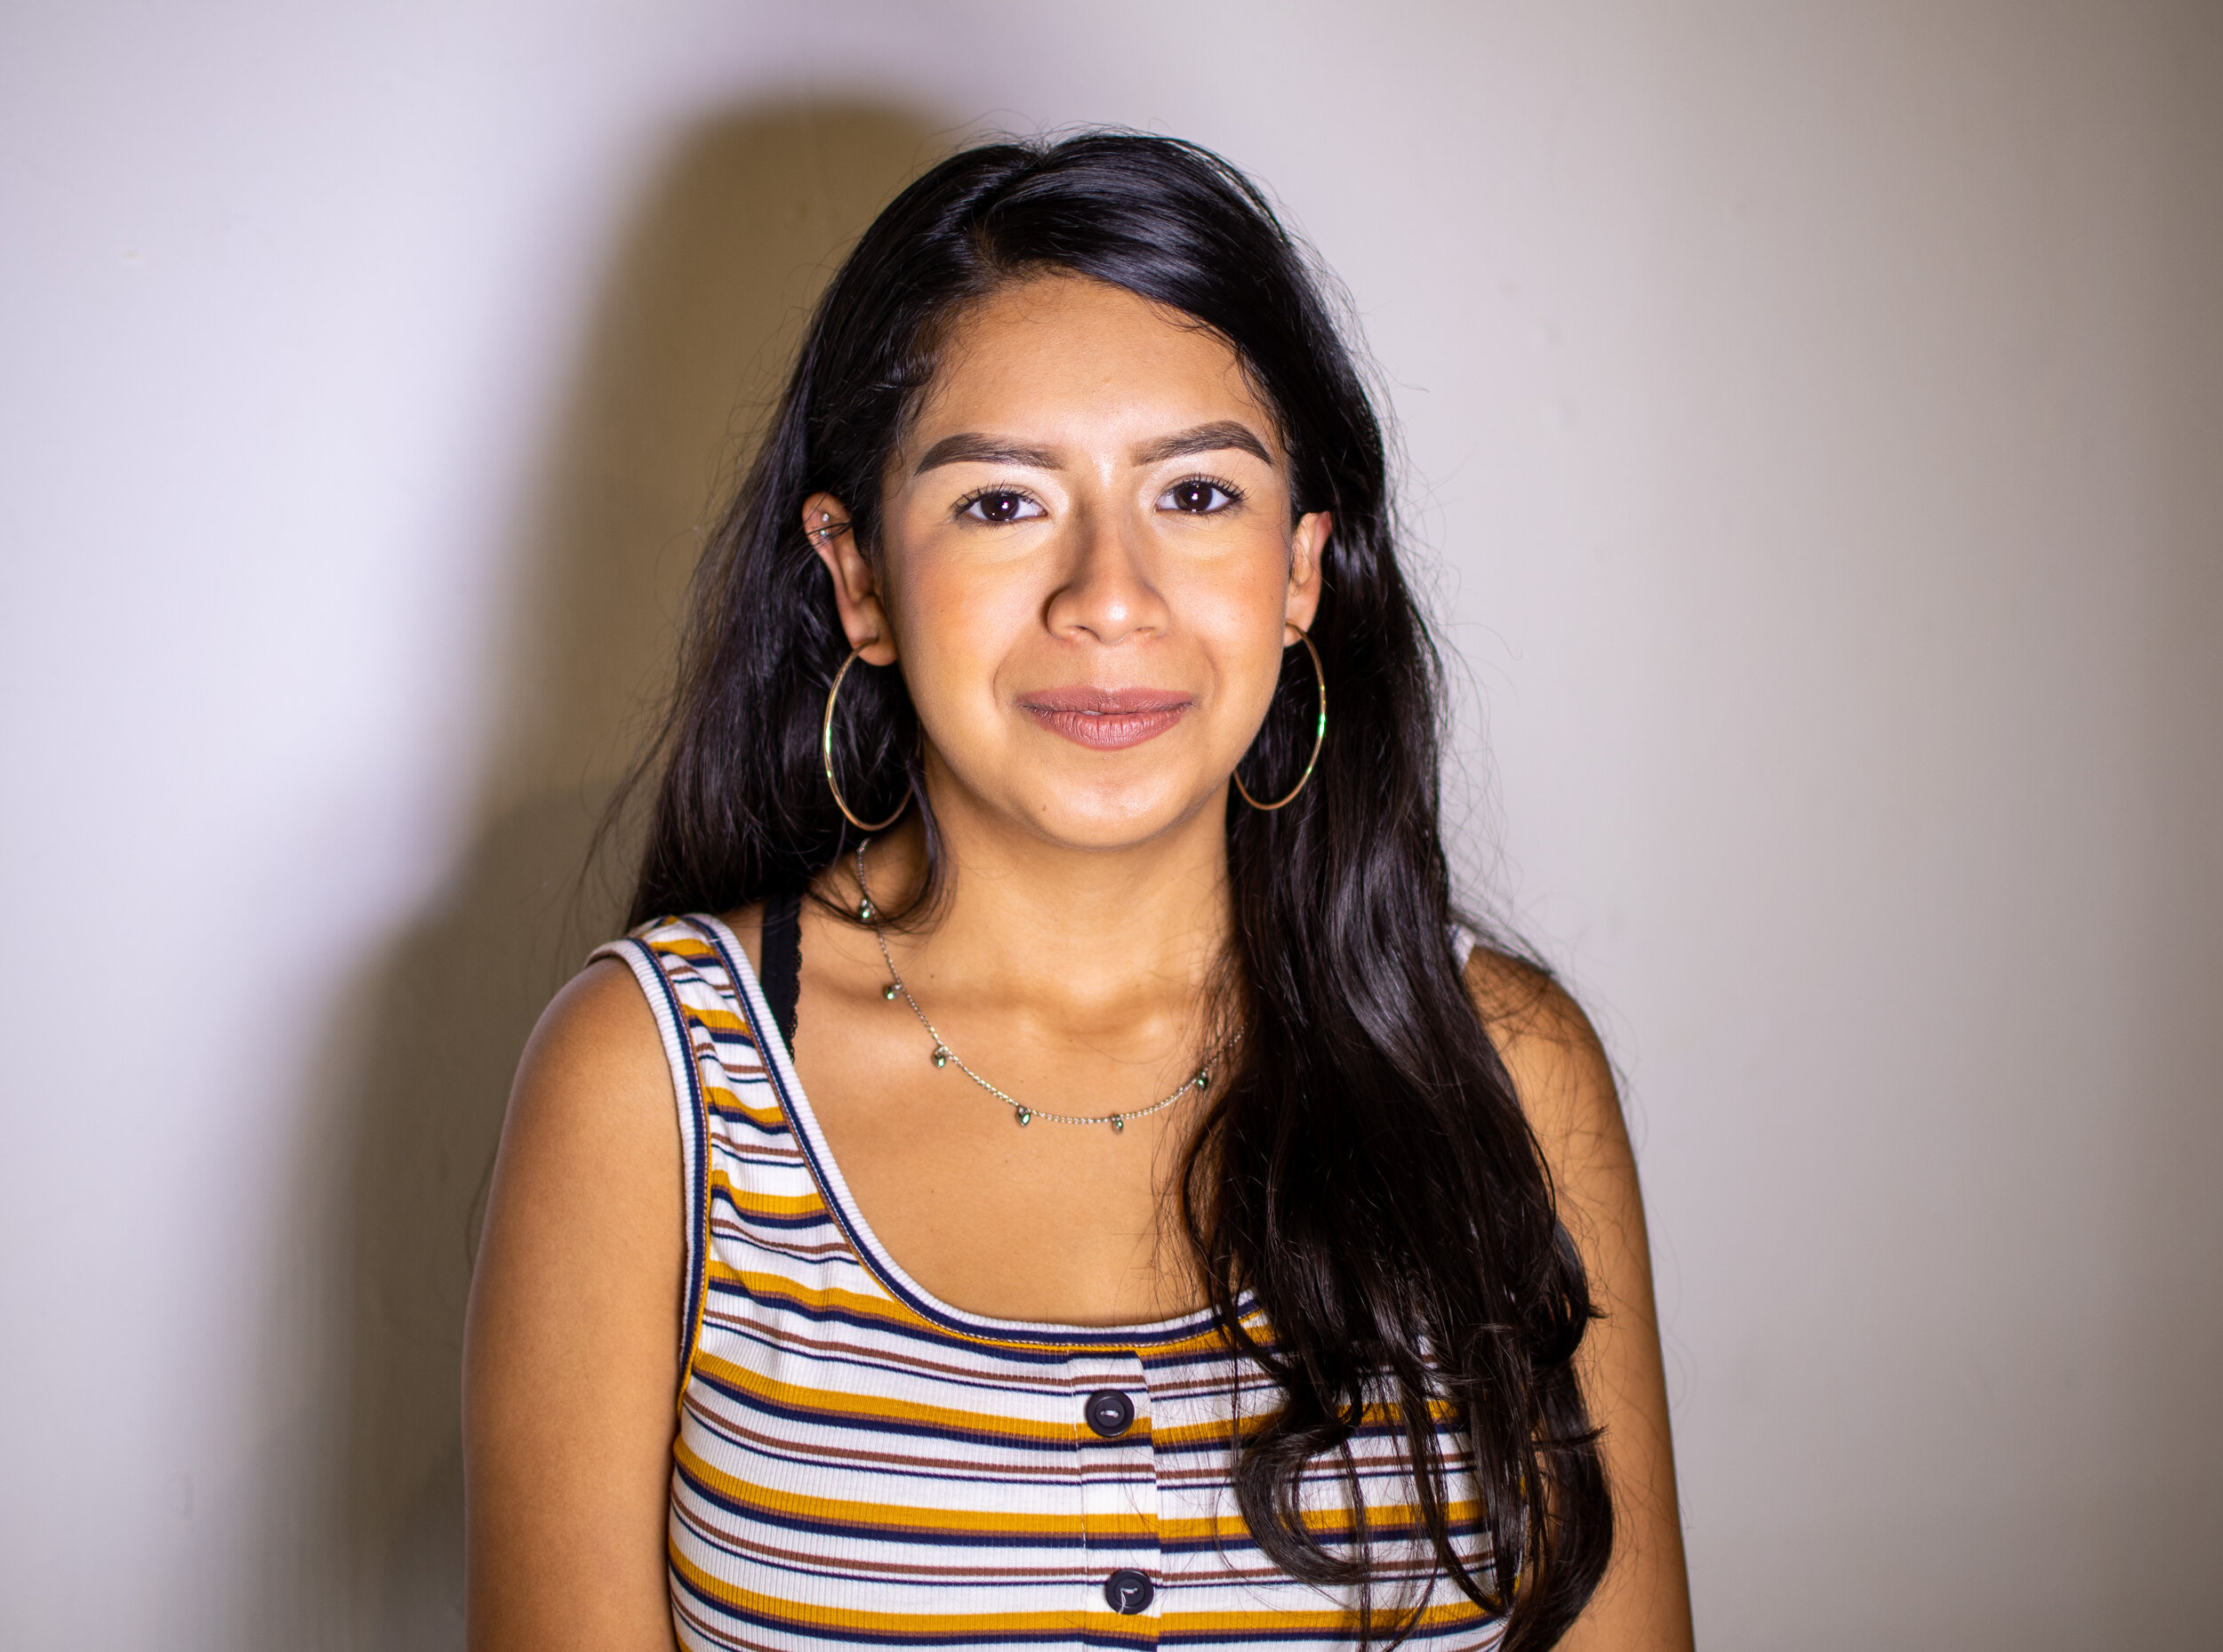 Angela Reyes Cervantes '22, she/her